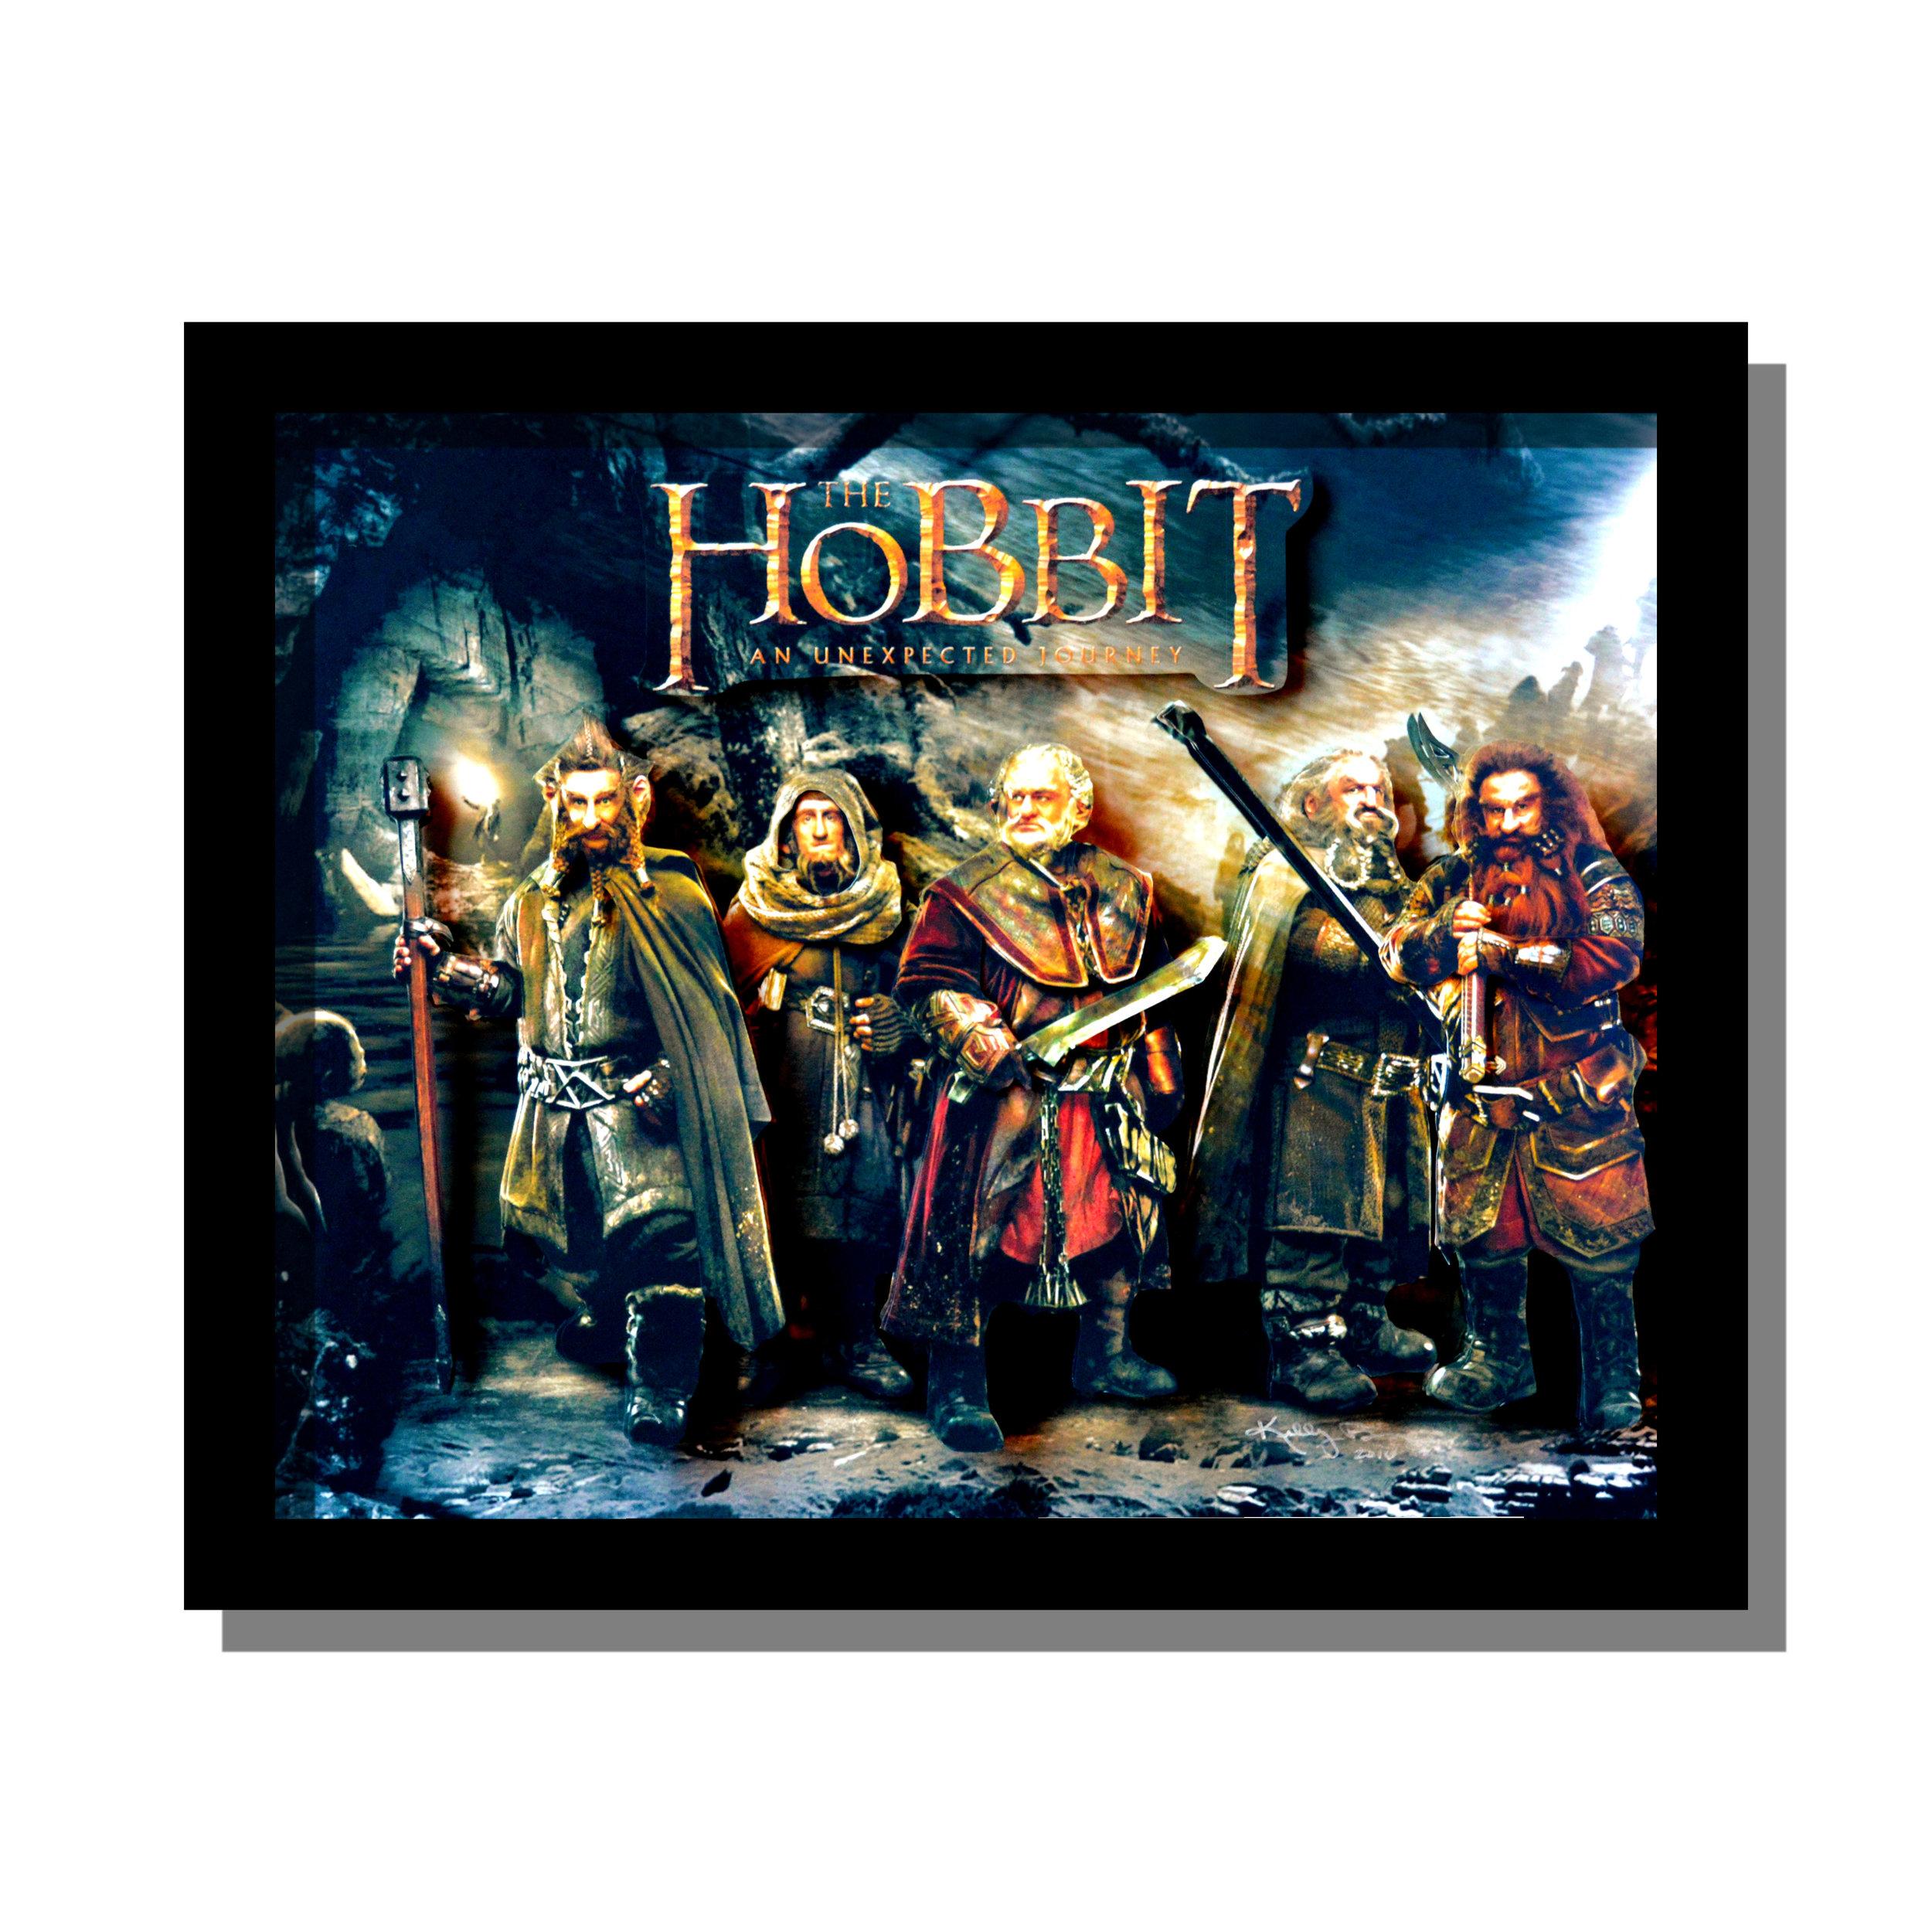 HobbitA2.jpg